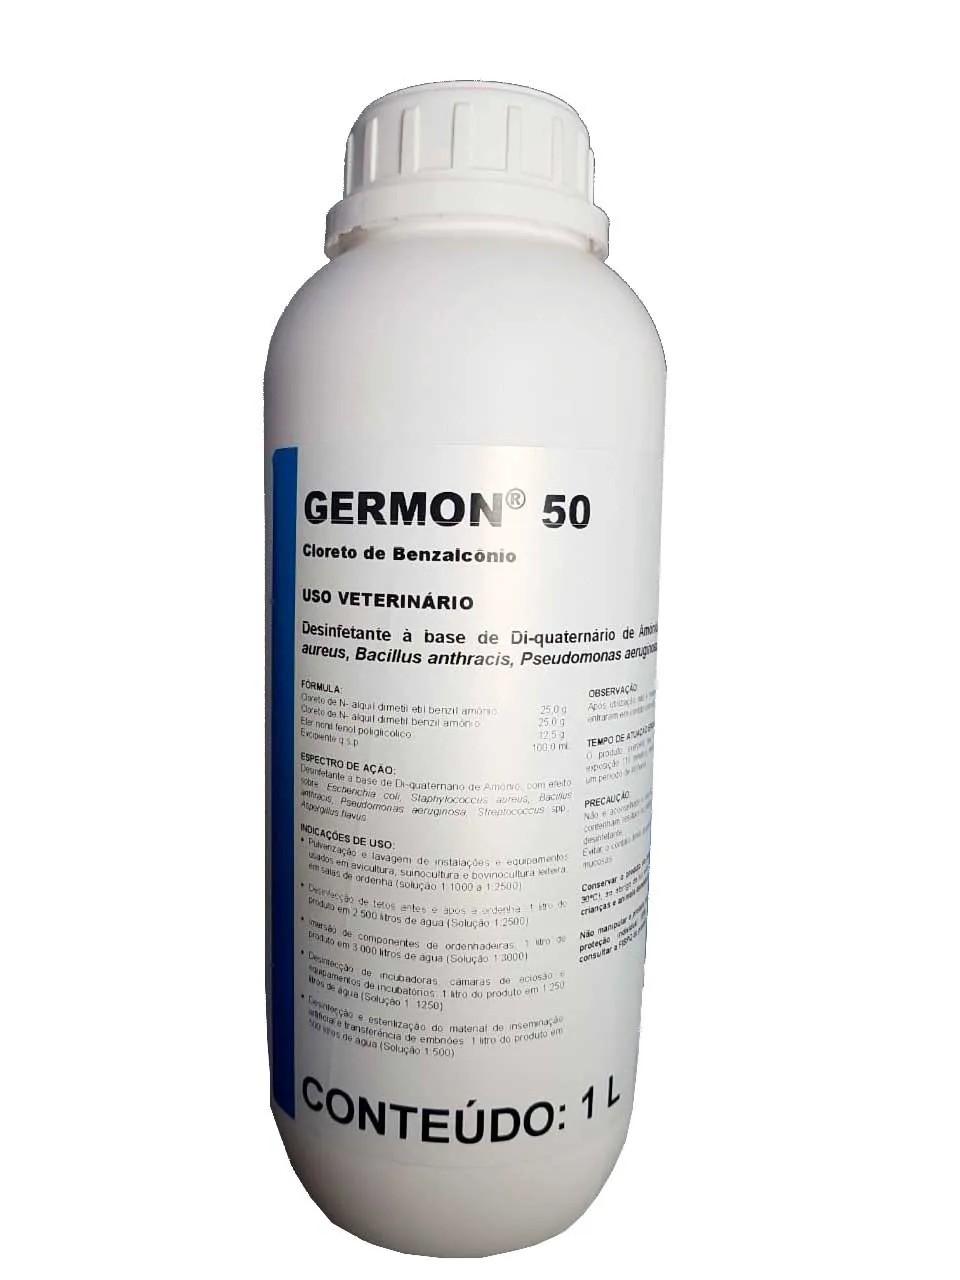 GERMON 50 - 1L